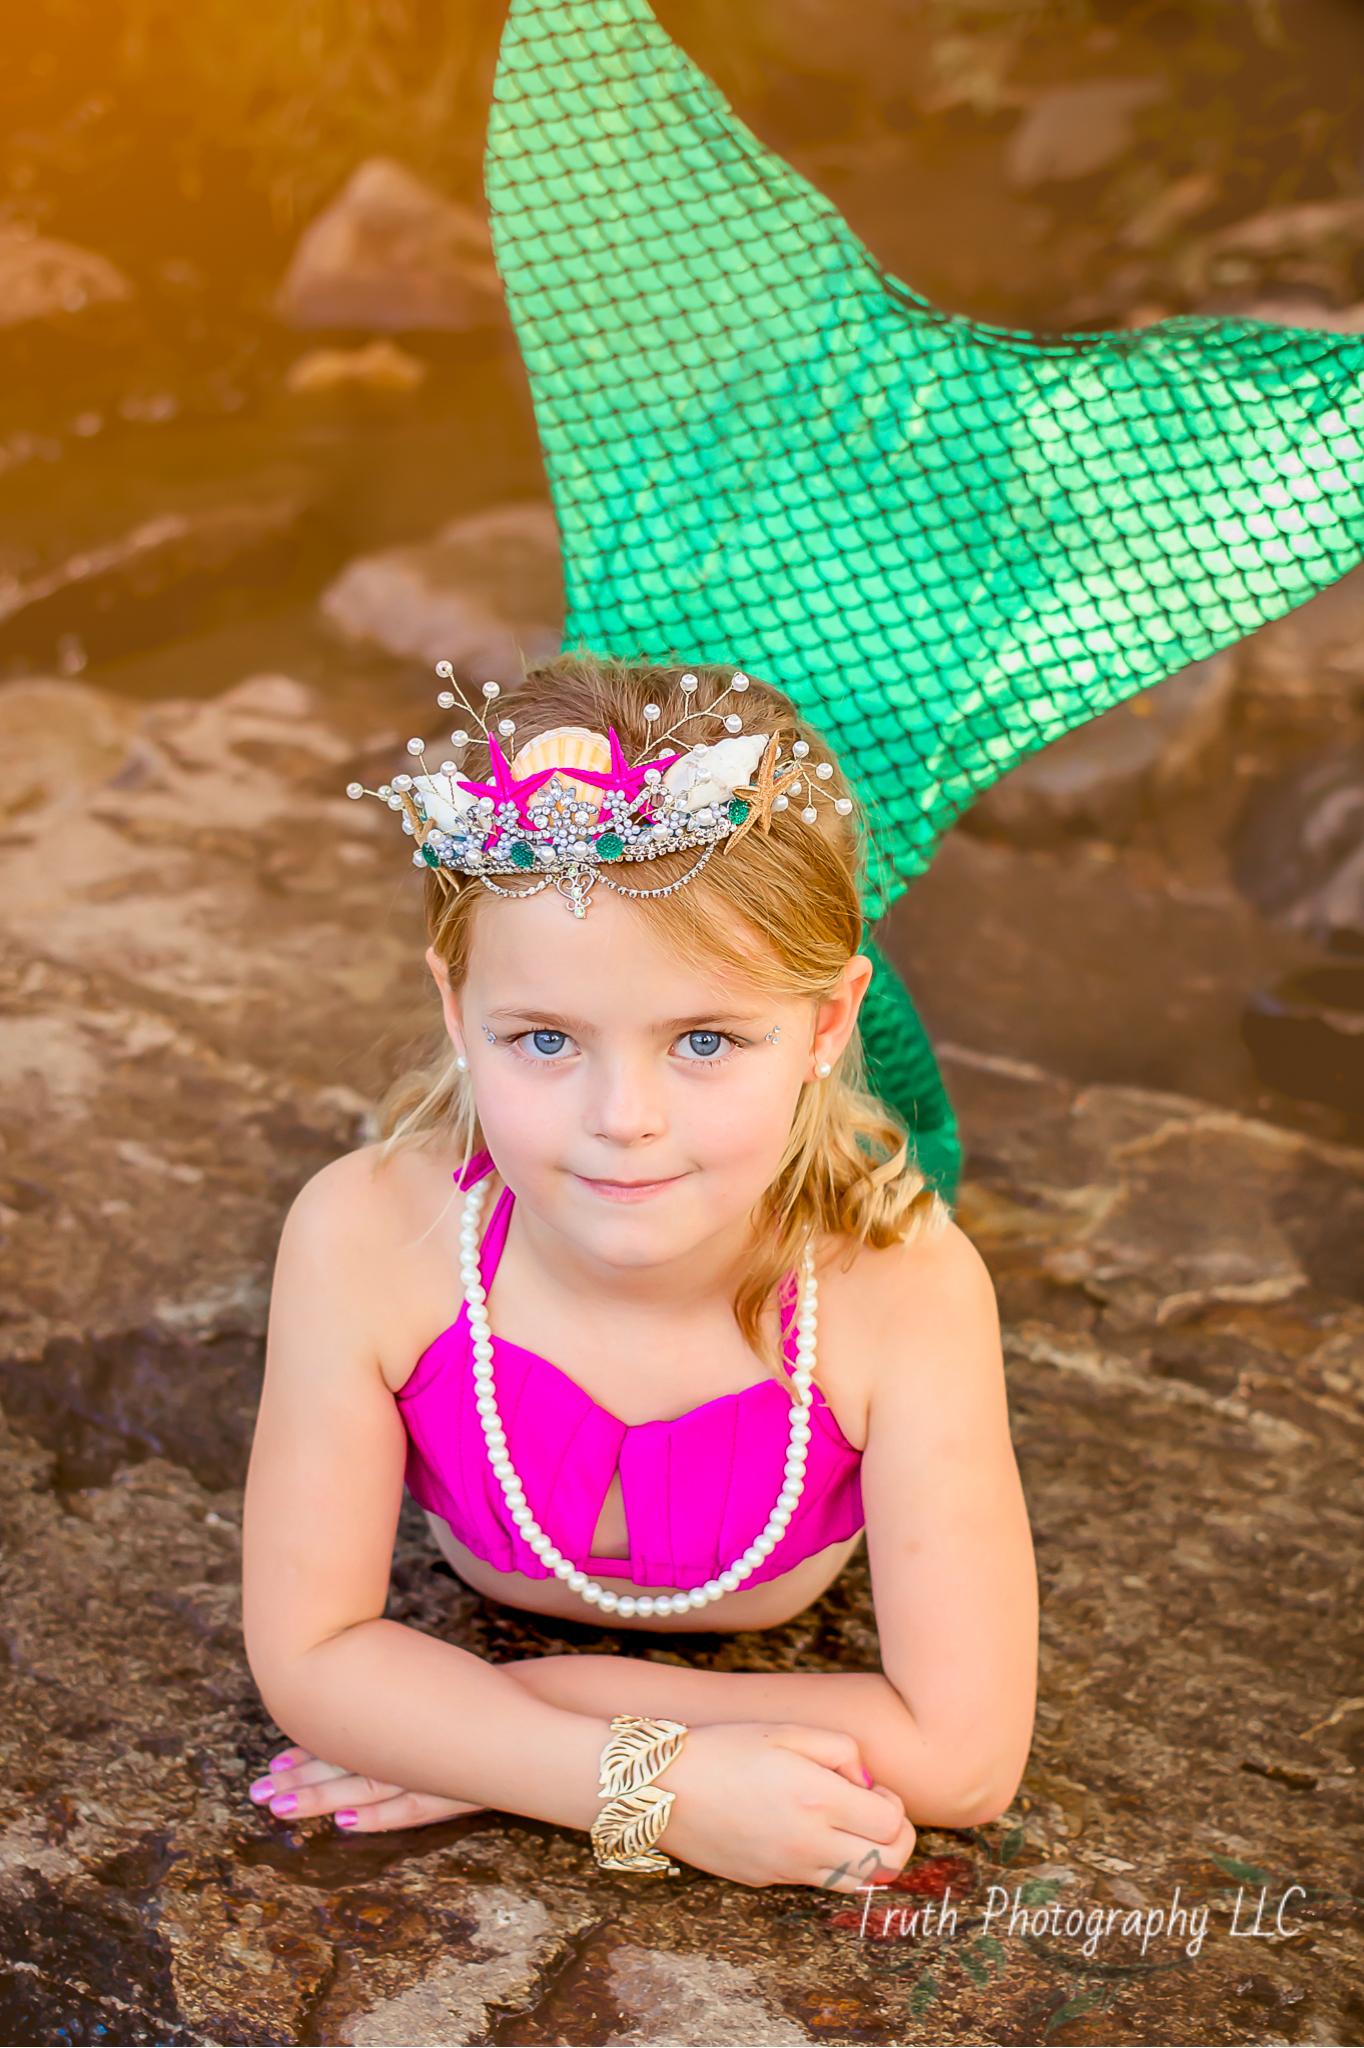 Truth-Photography-Denver-CO-mermaid-photographer.jpg